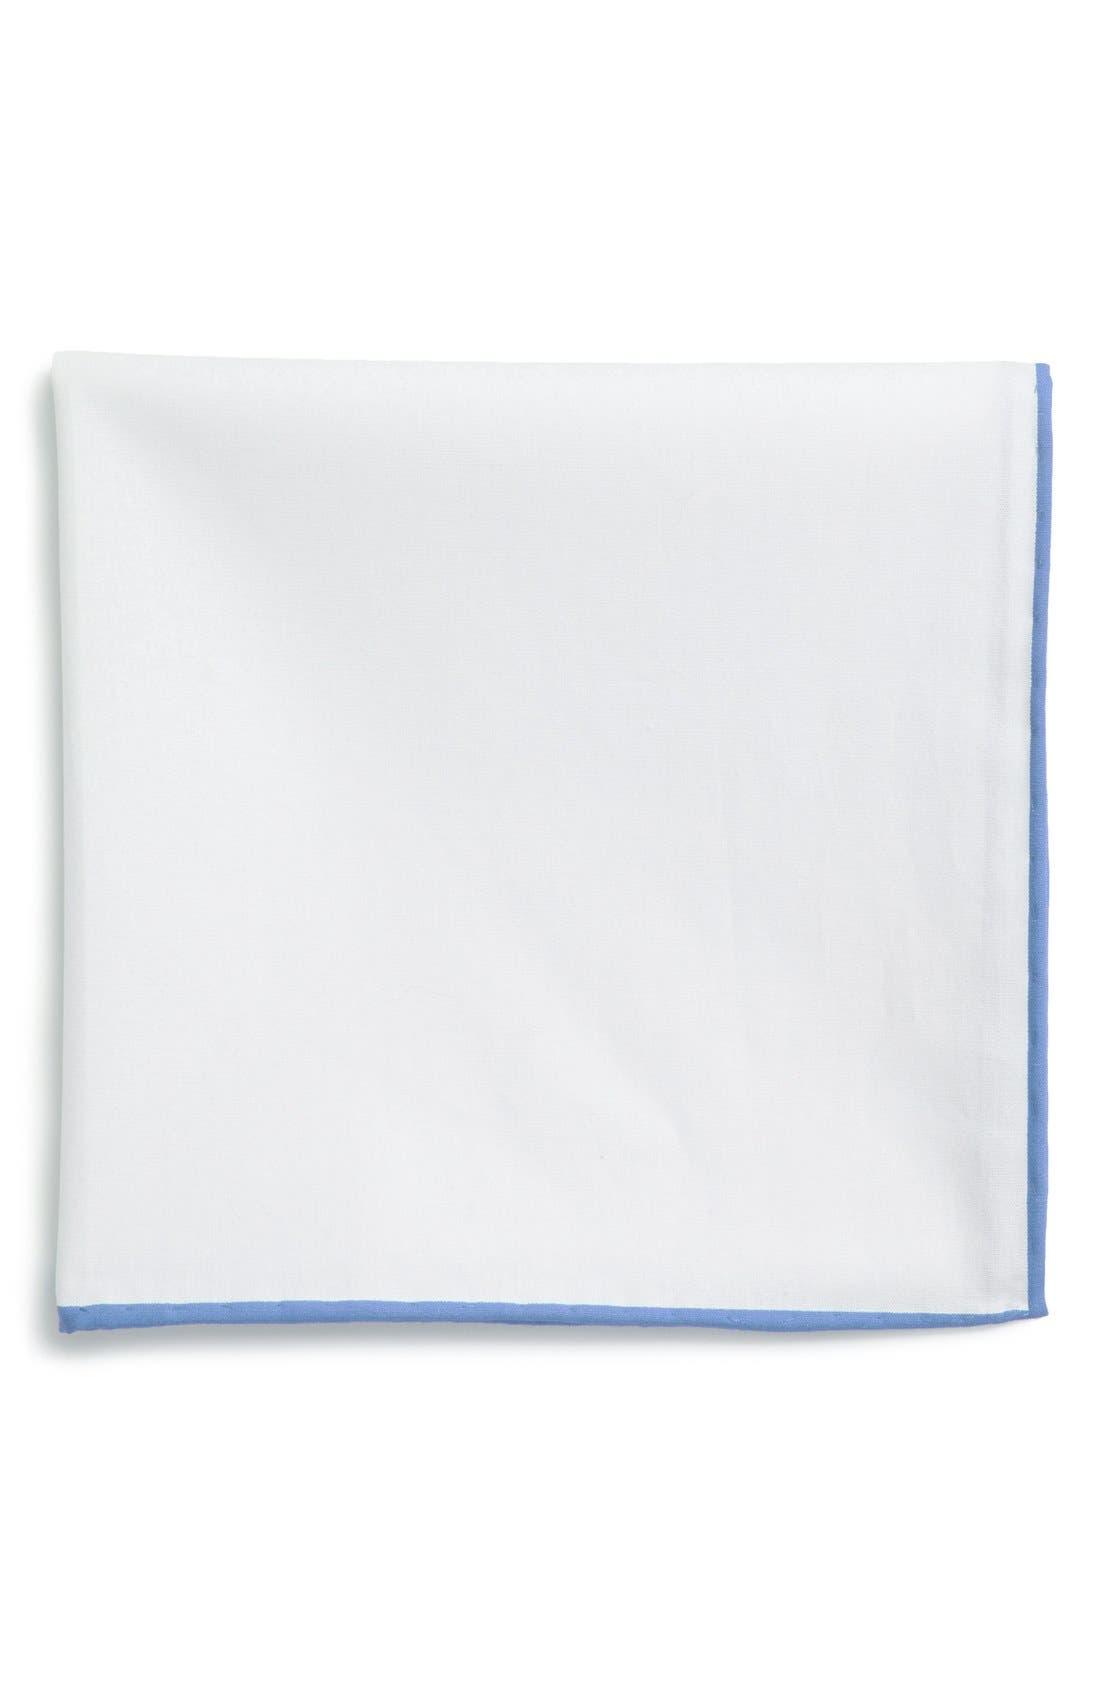 Cotton Solid Pocket Square,                         Main,                         color, White/ Light Blue